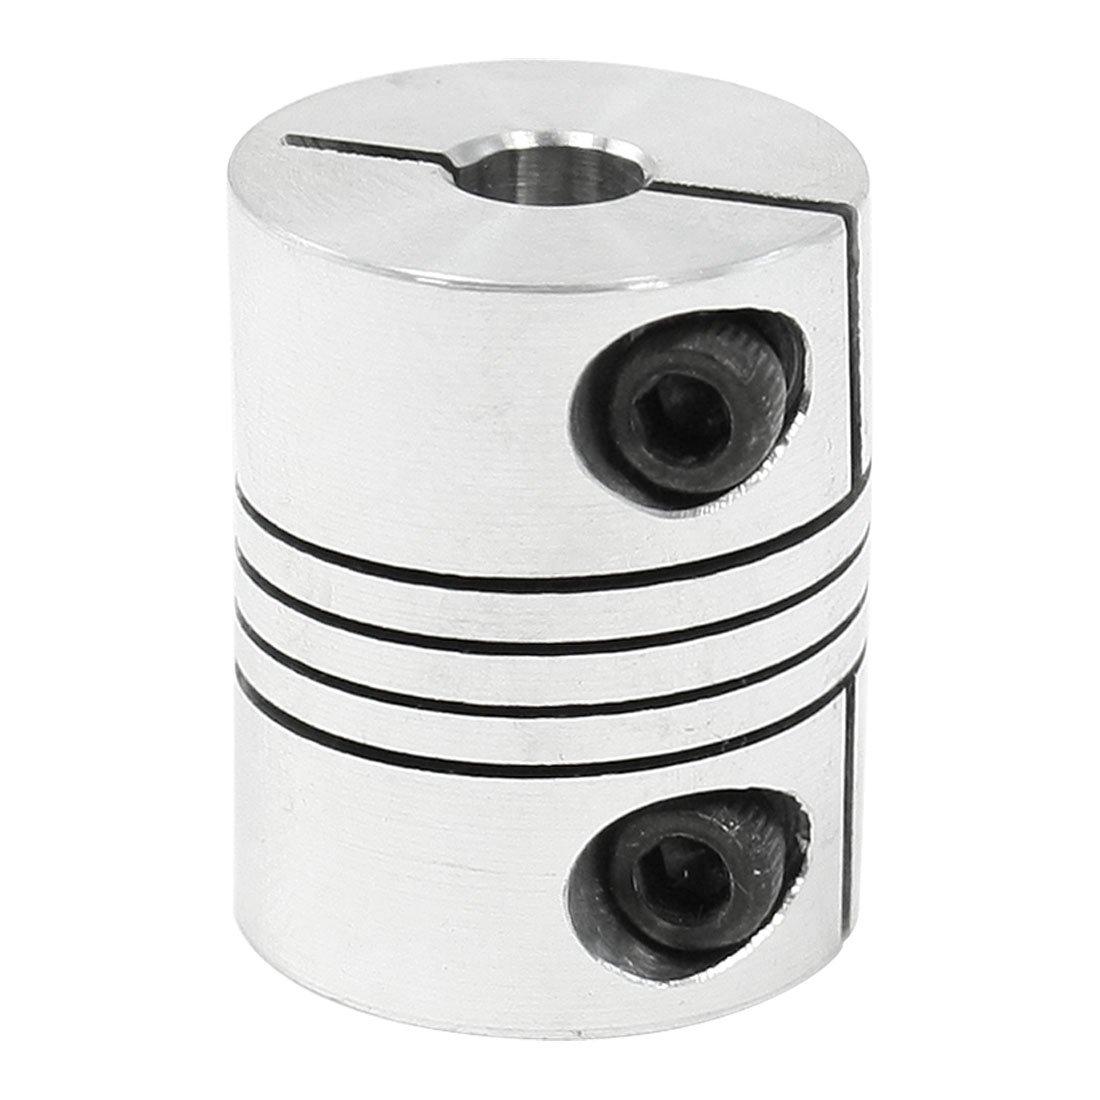 25s8 Cnc Motor Shaft Coupler To 8mm Flexible